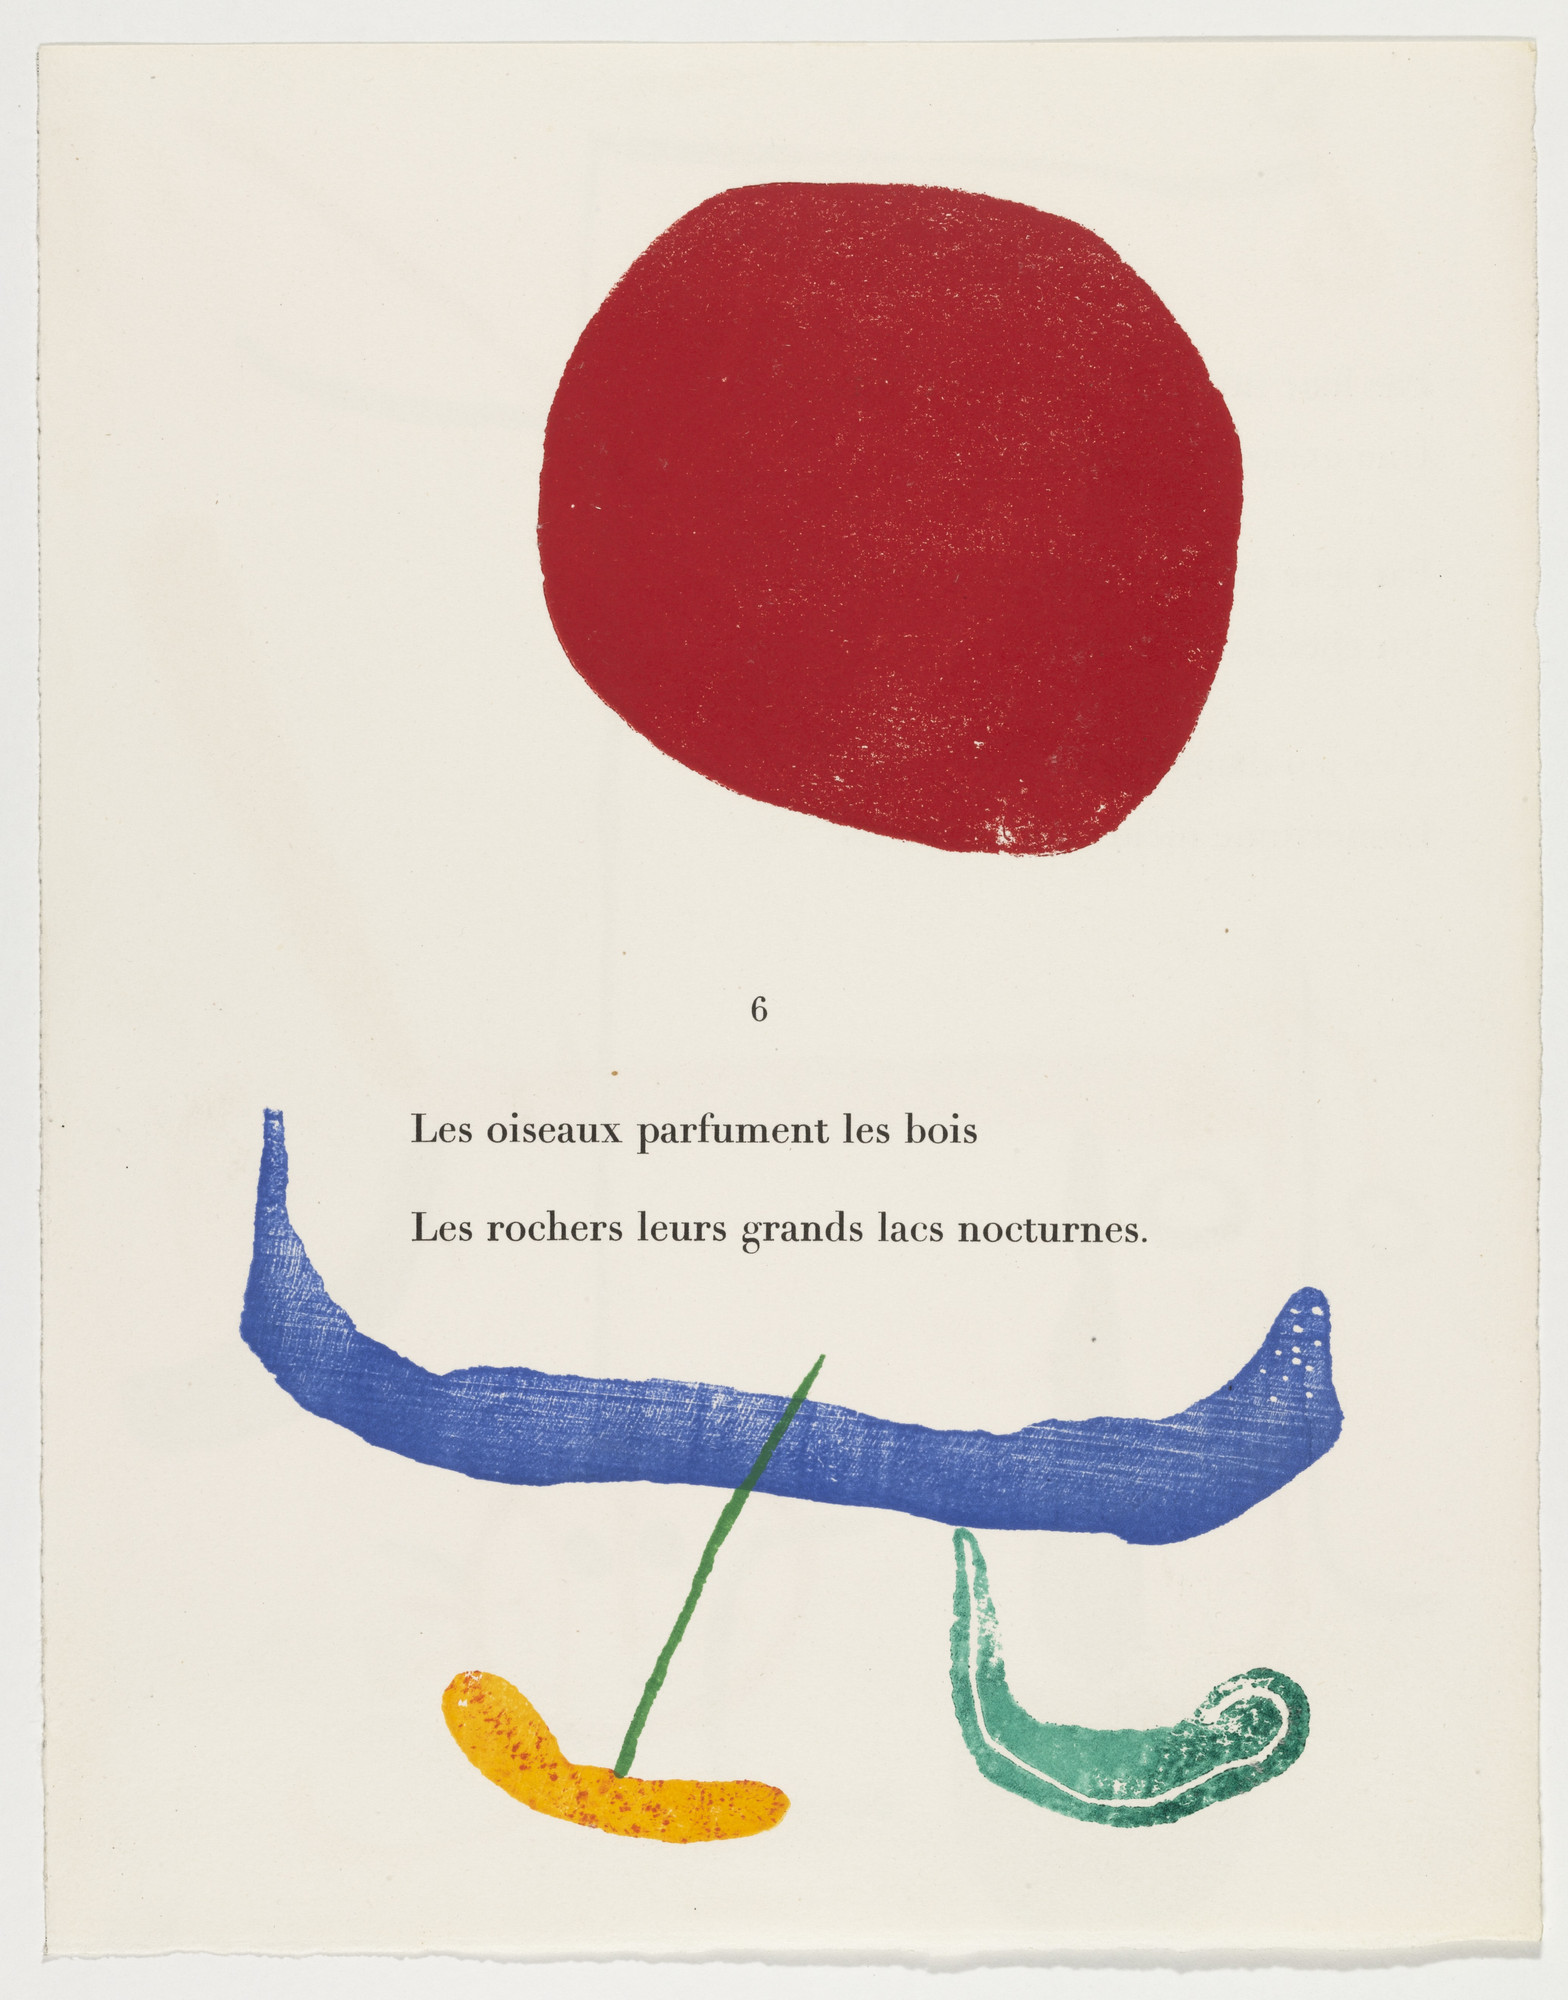 Joan Miró. Proof from À toute épreuve (Proof Against All) by Paul Éluard. 1947–58 | MoMA